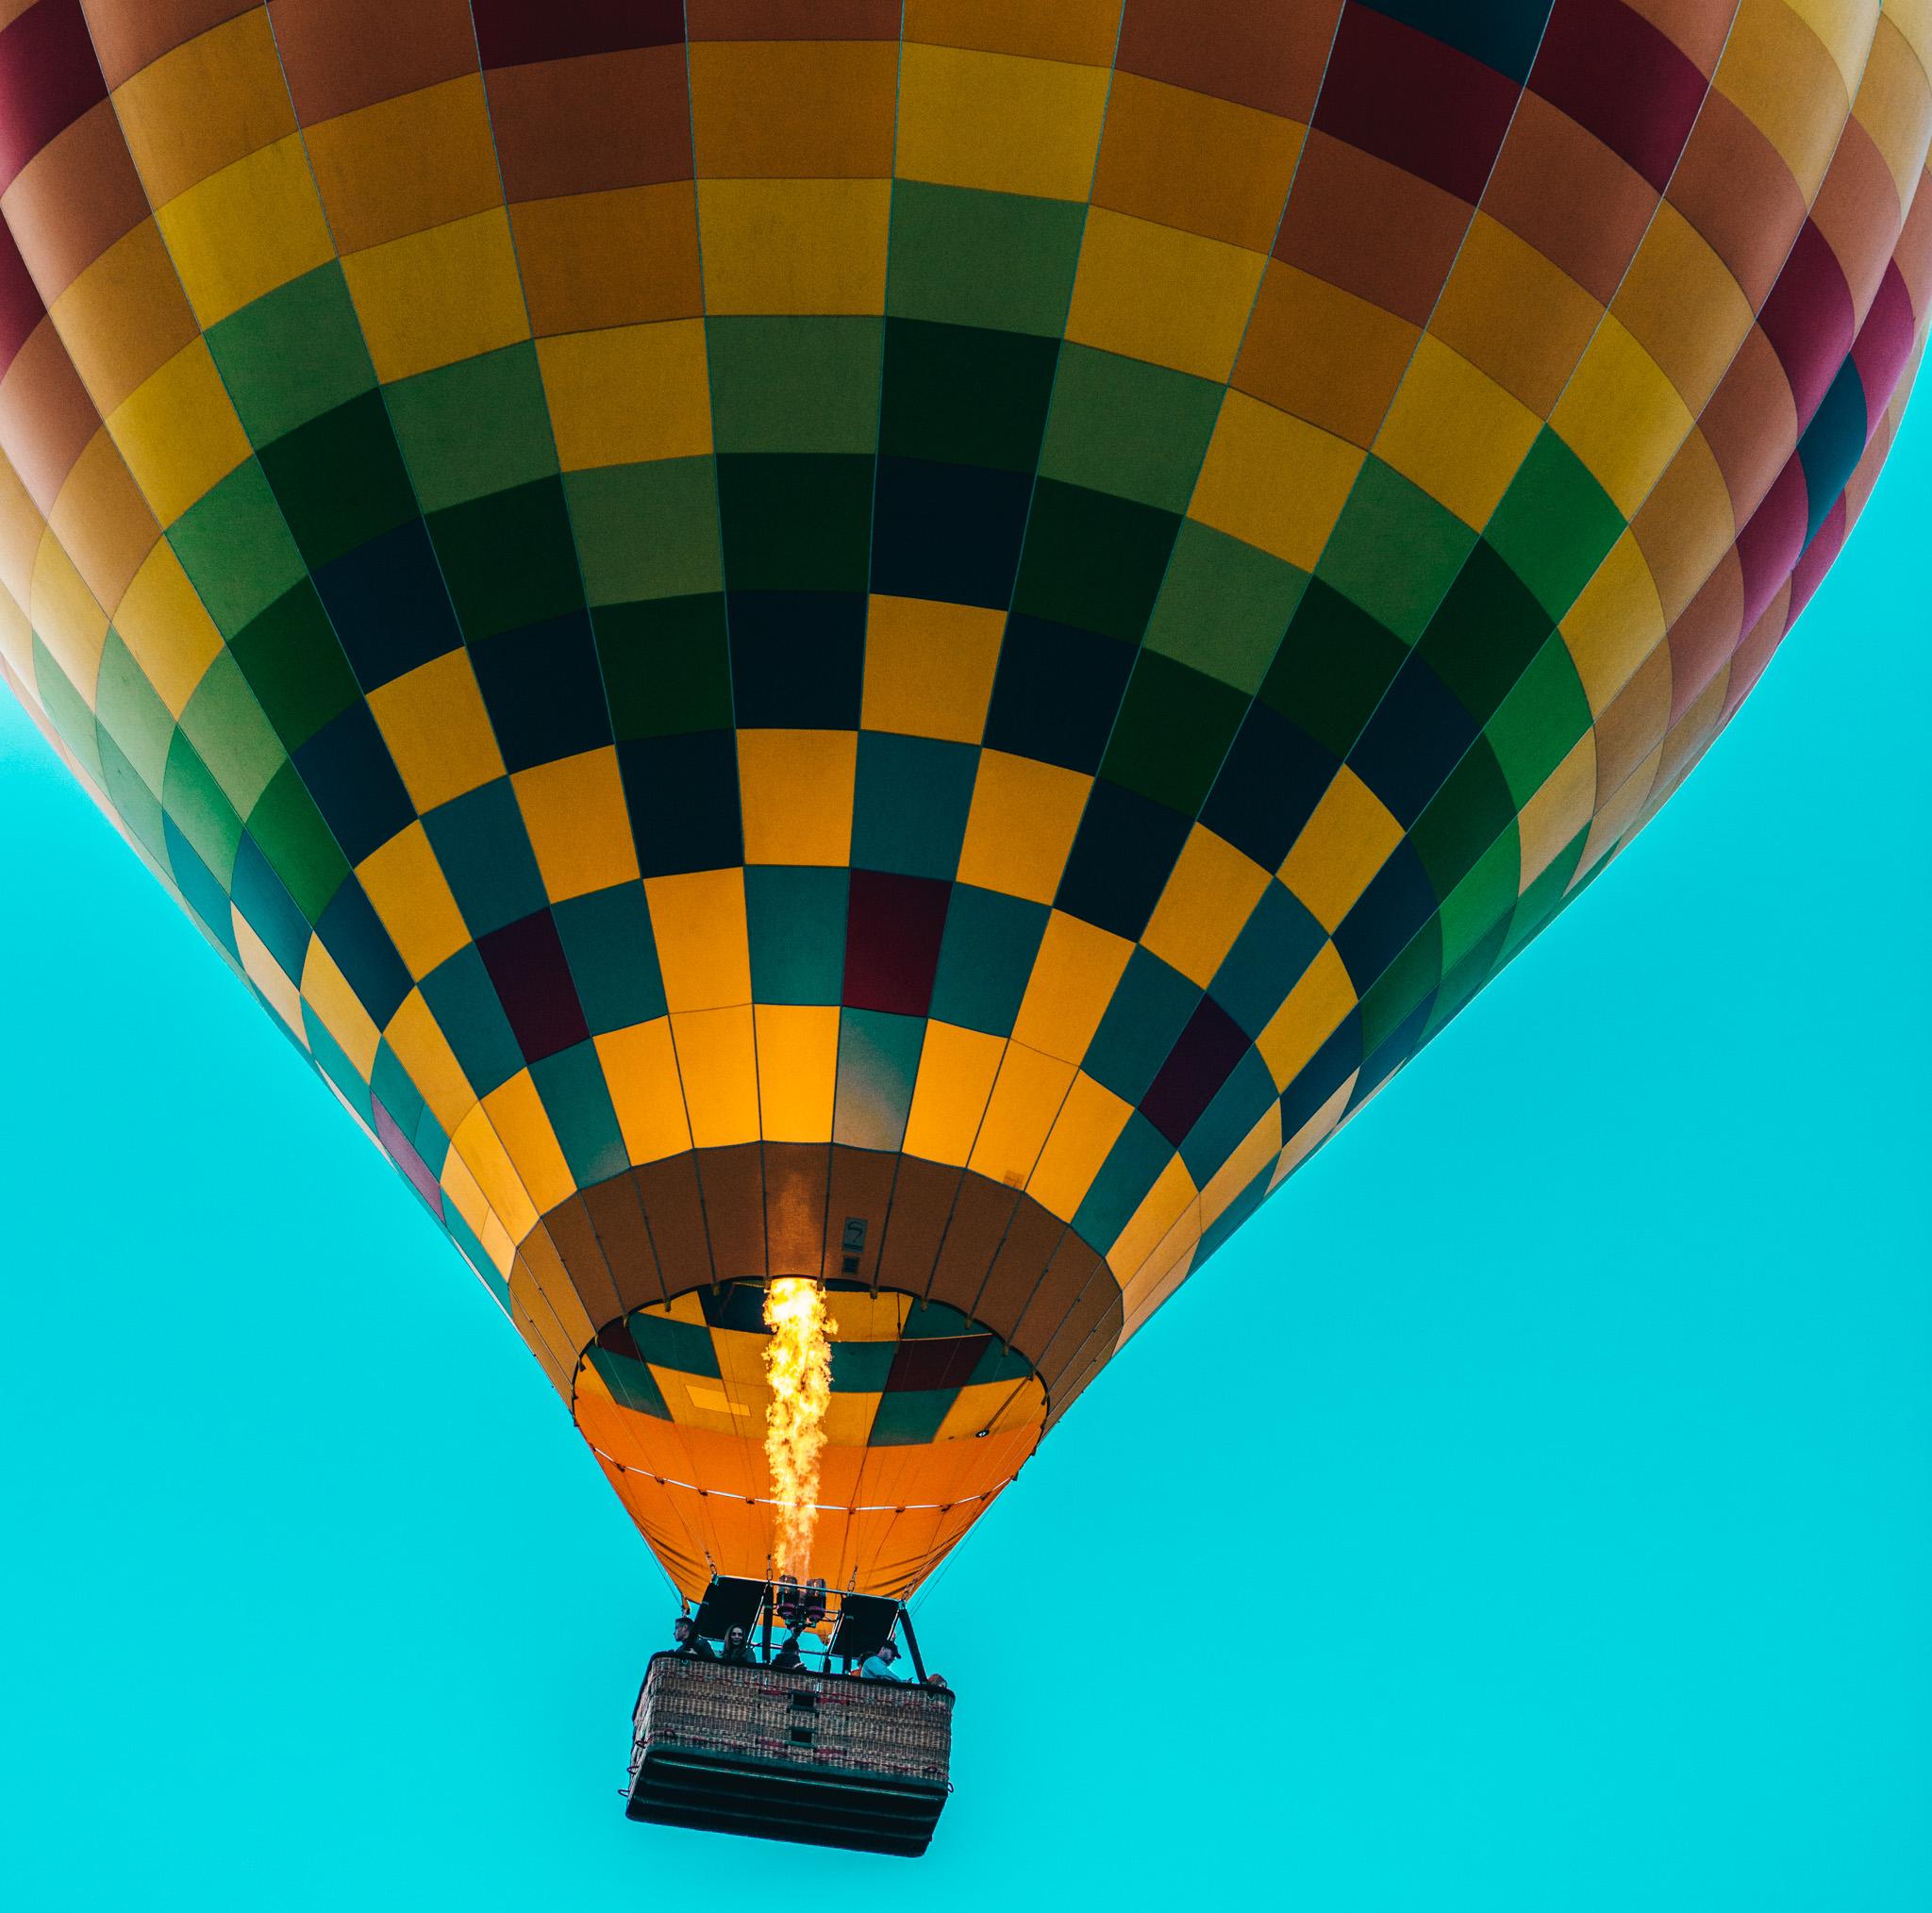 California : Napa Valley : Balloons over Yountville